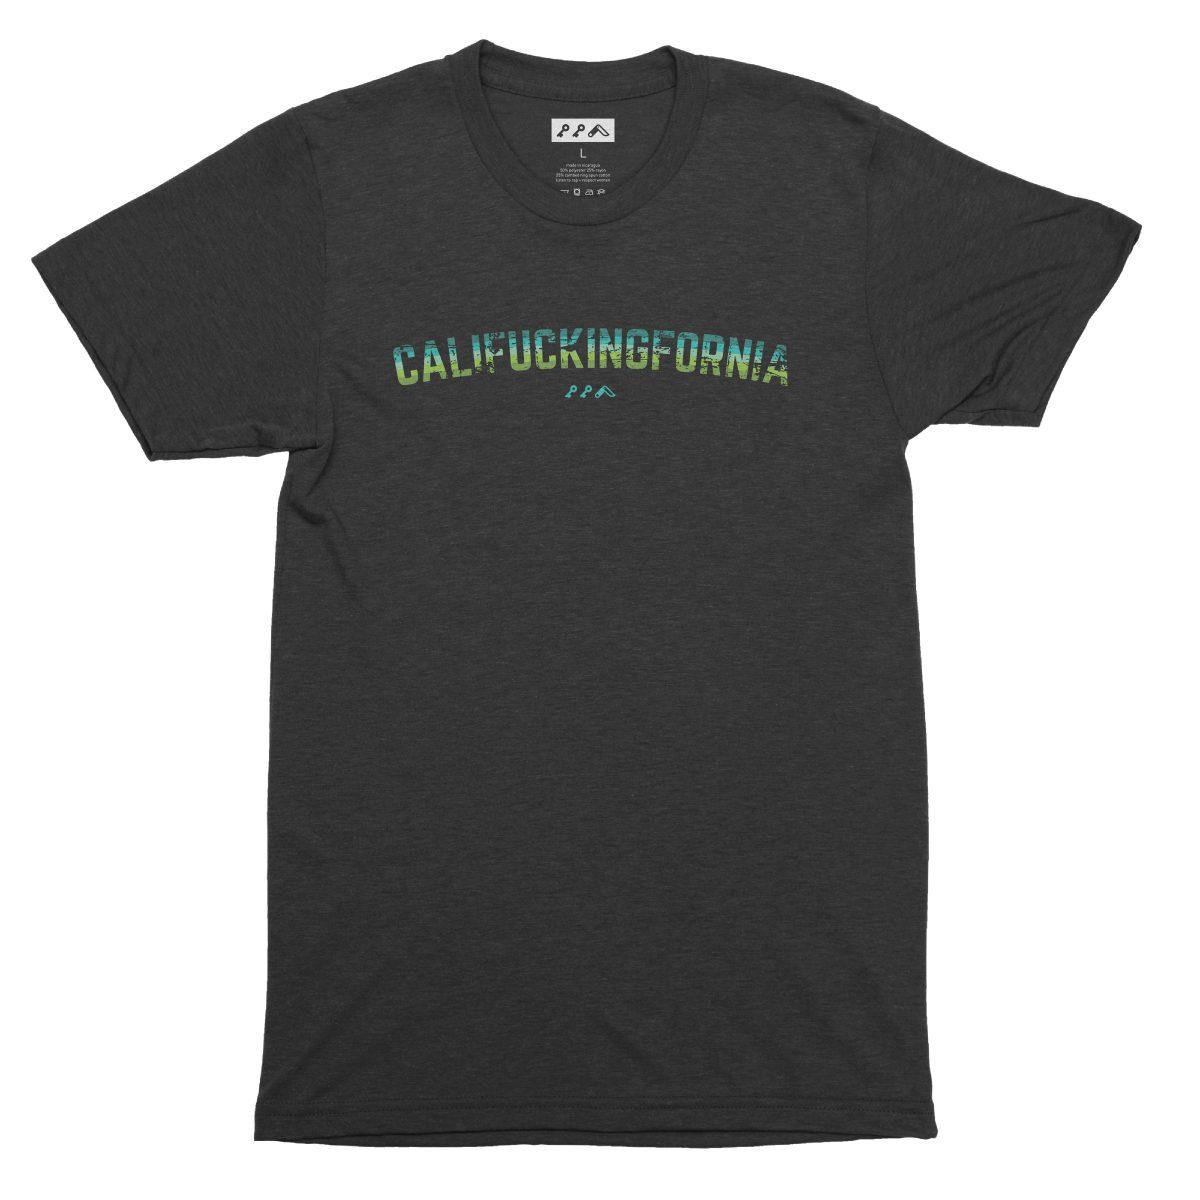 califuckingfornia 90s design retro tee in charcoal black by kikicutt t-shirt store